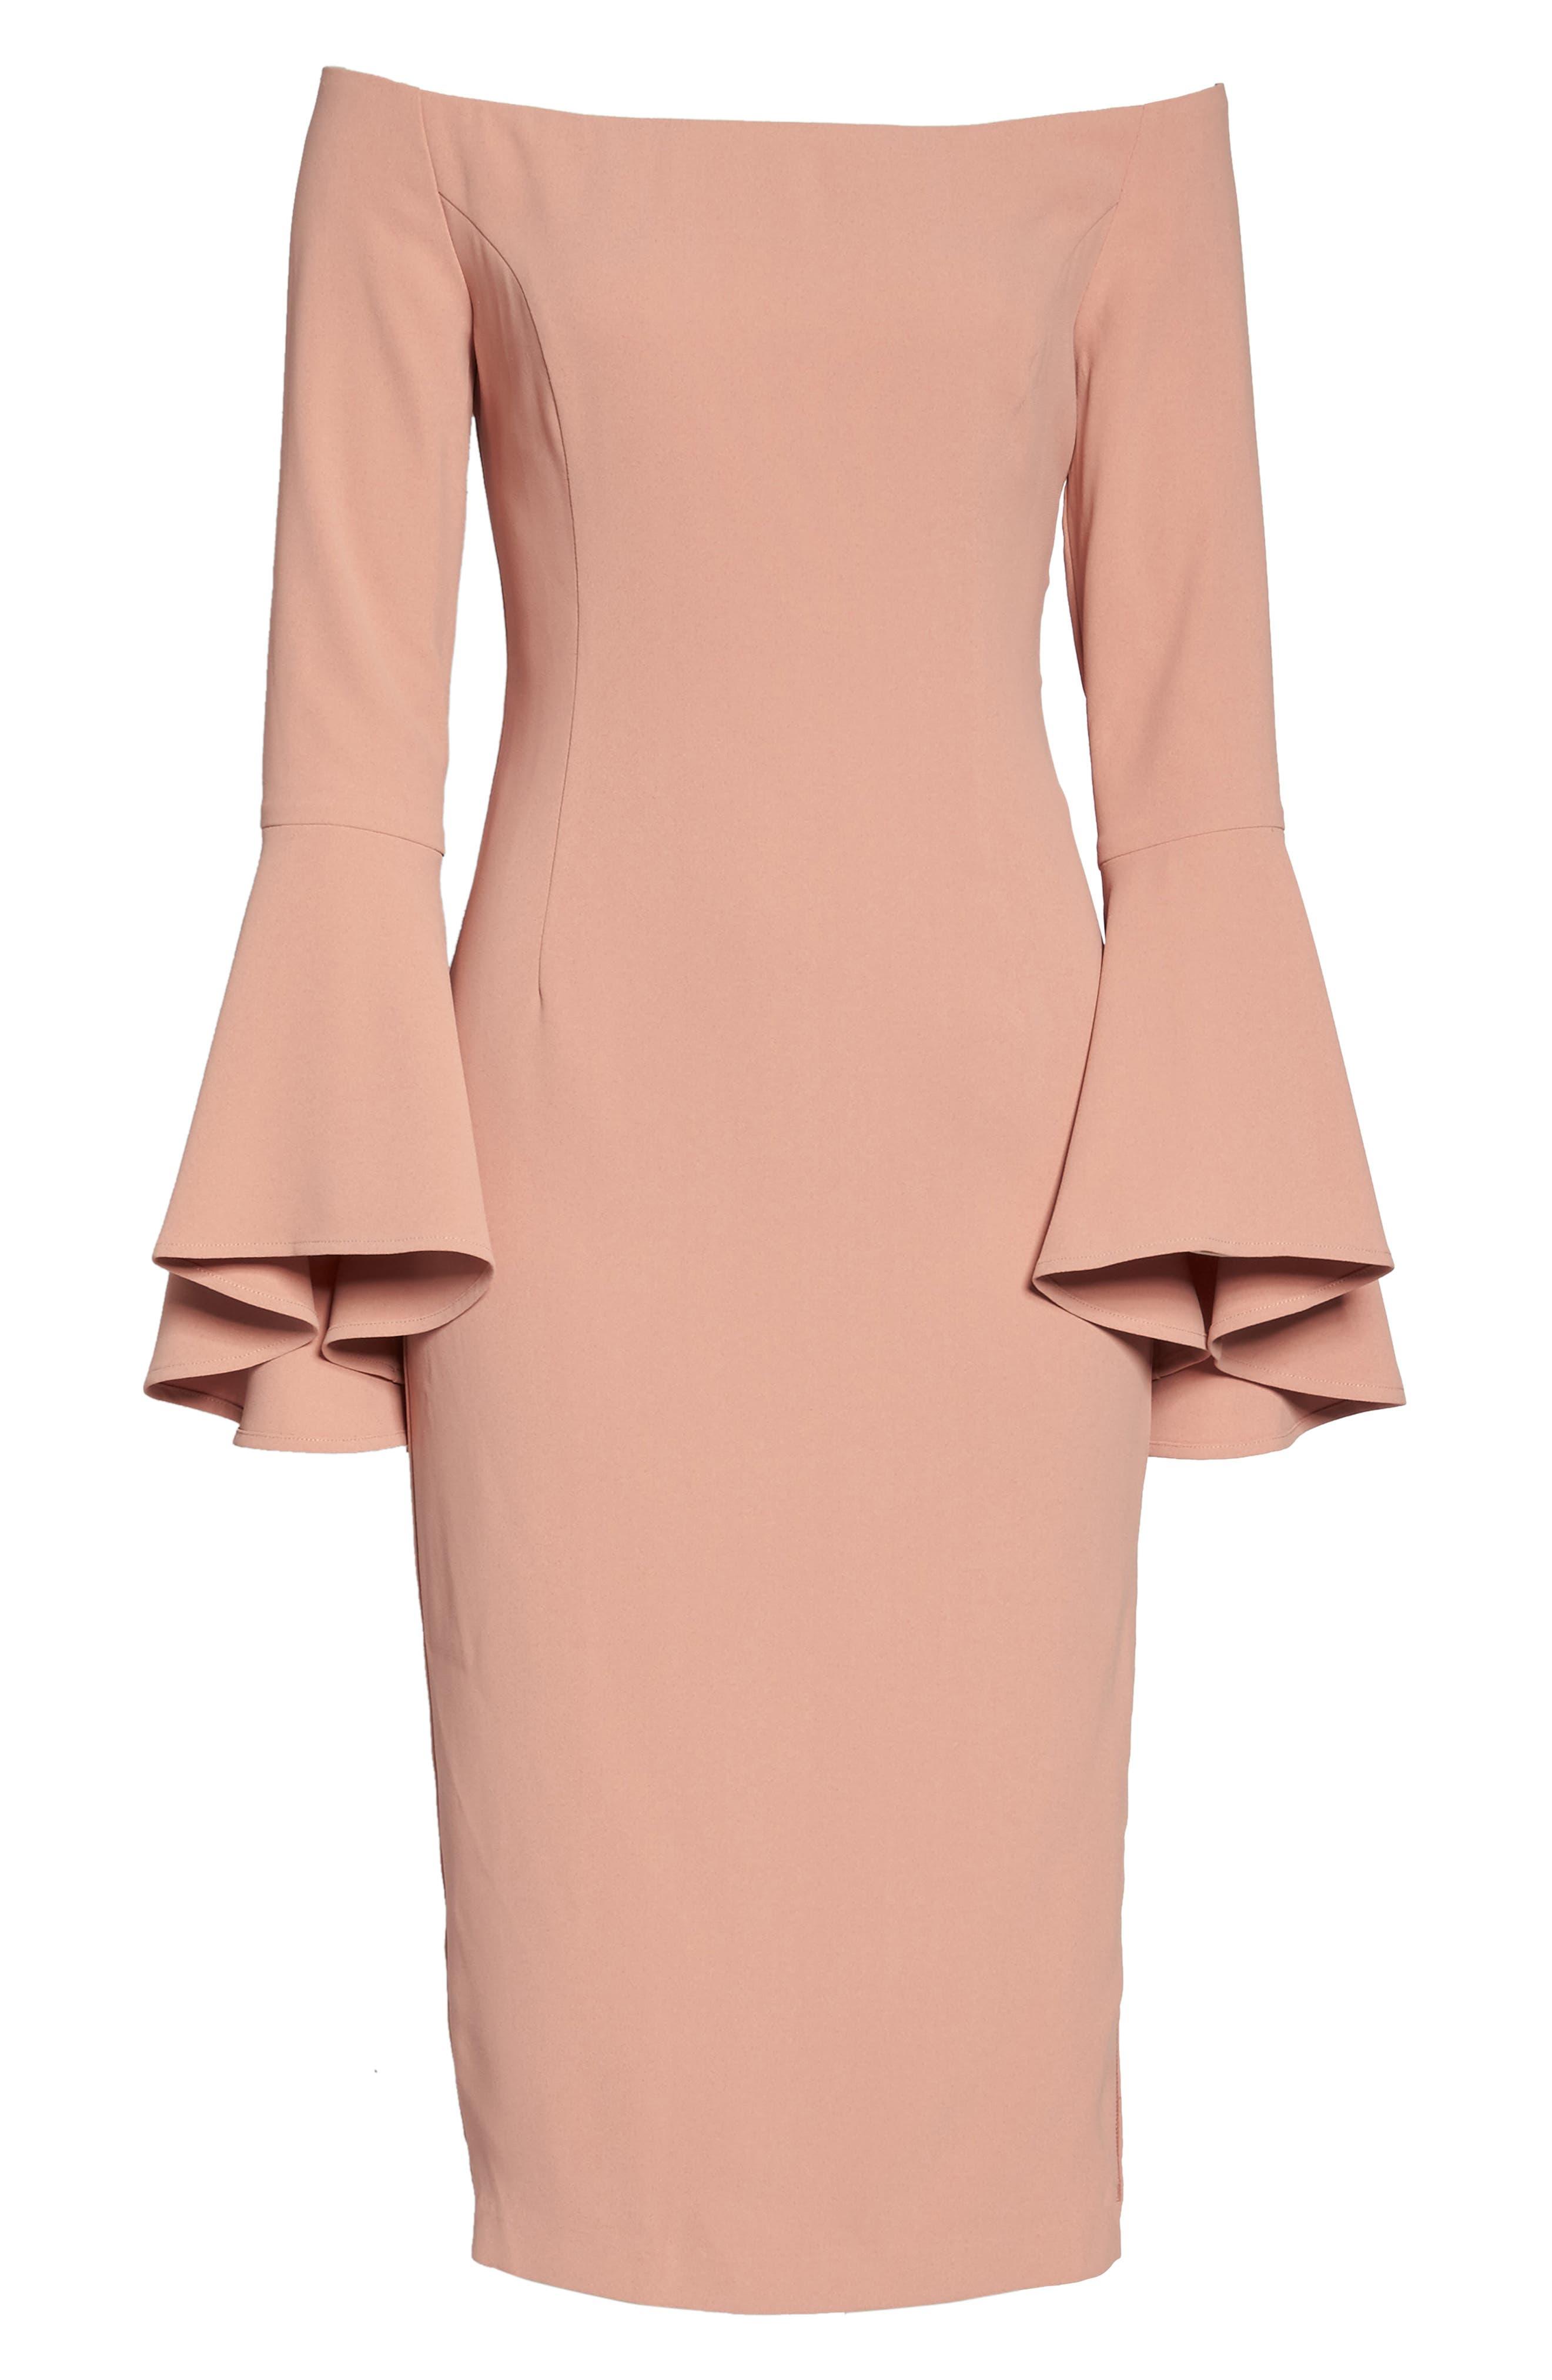 'Solange' Off the Shoulder Midi Dress,                             Alternate thumbnail 24, color,